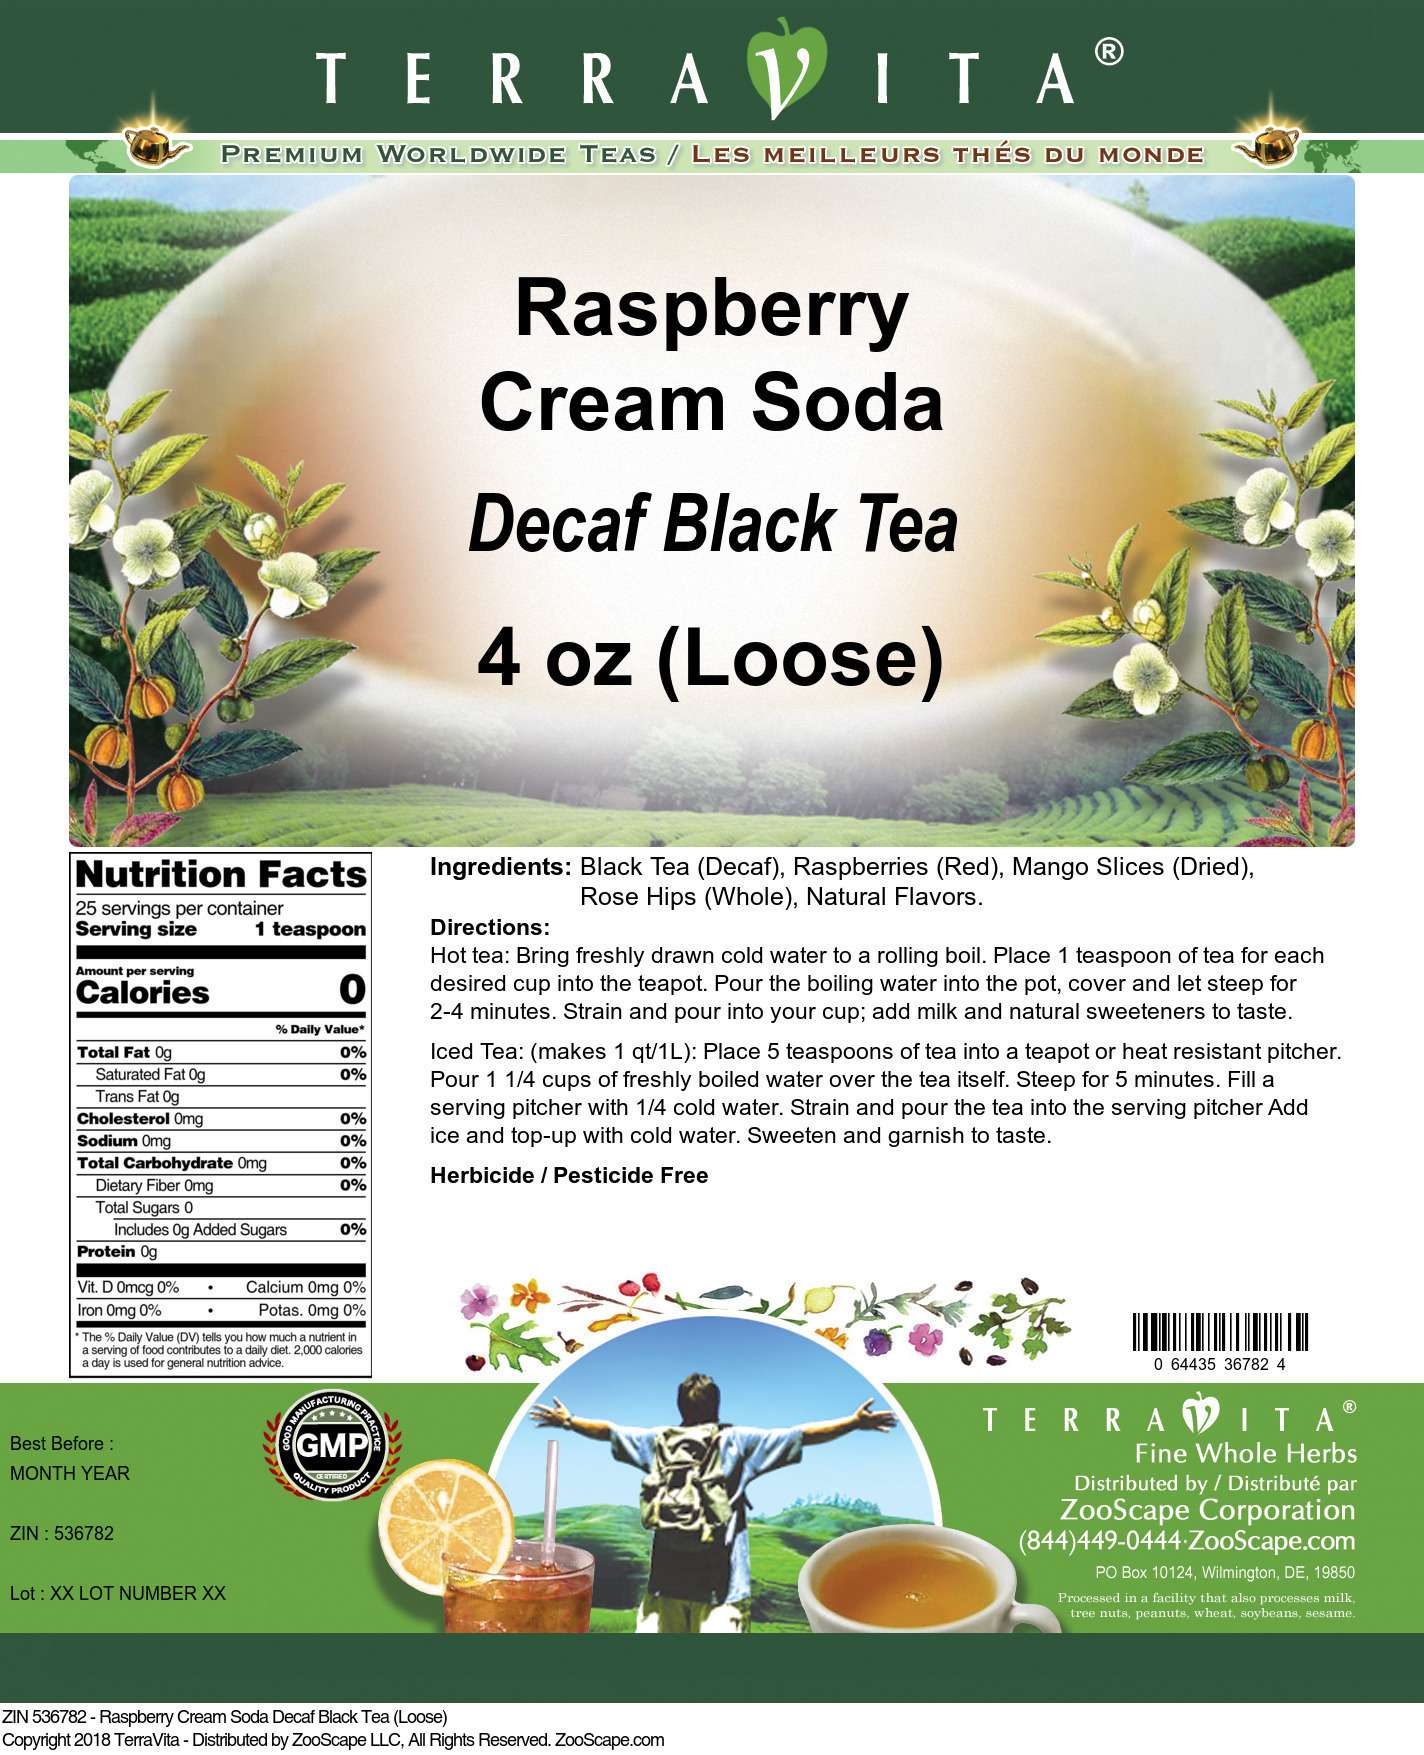 Raspberry Cream Soda Decaf Black Tea (Loose)